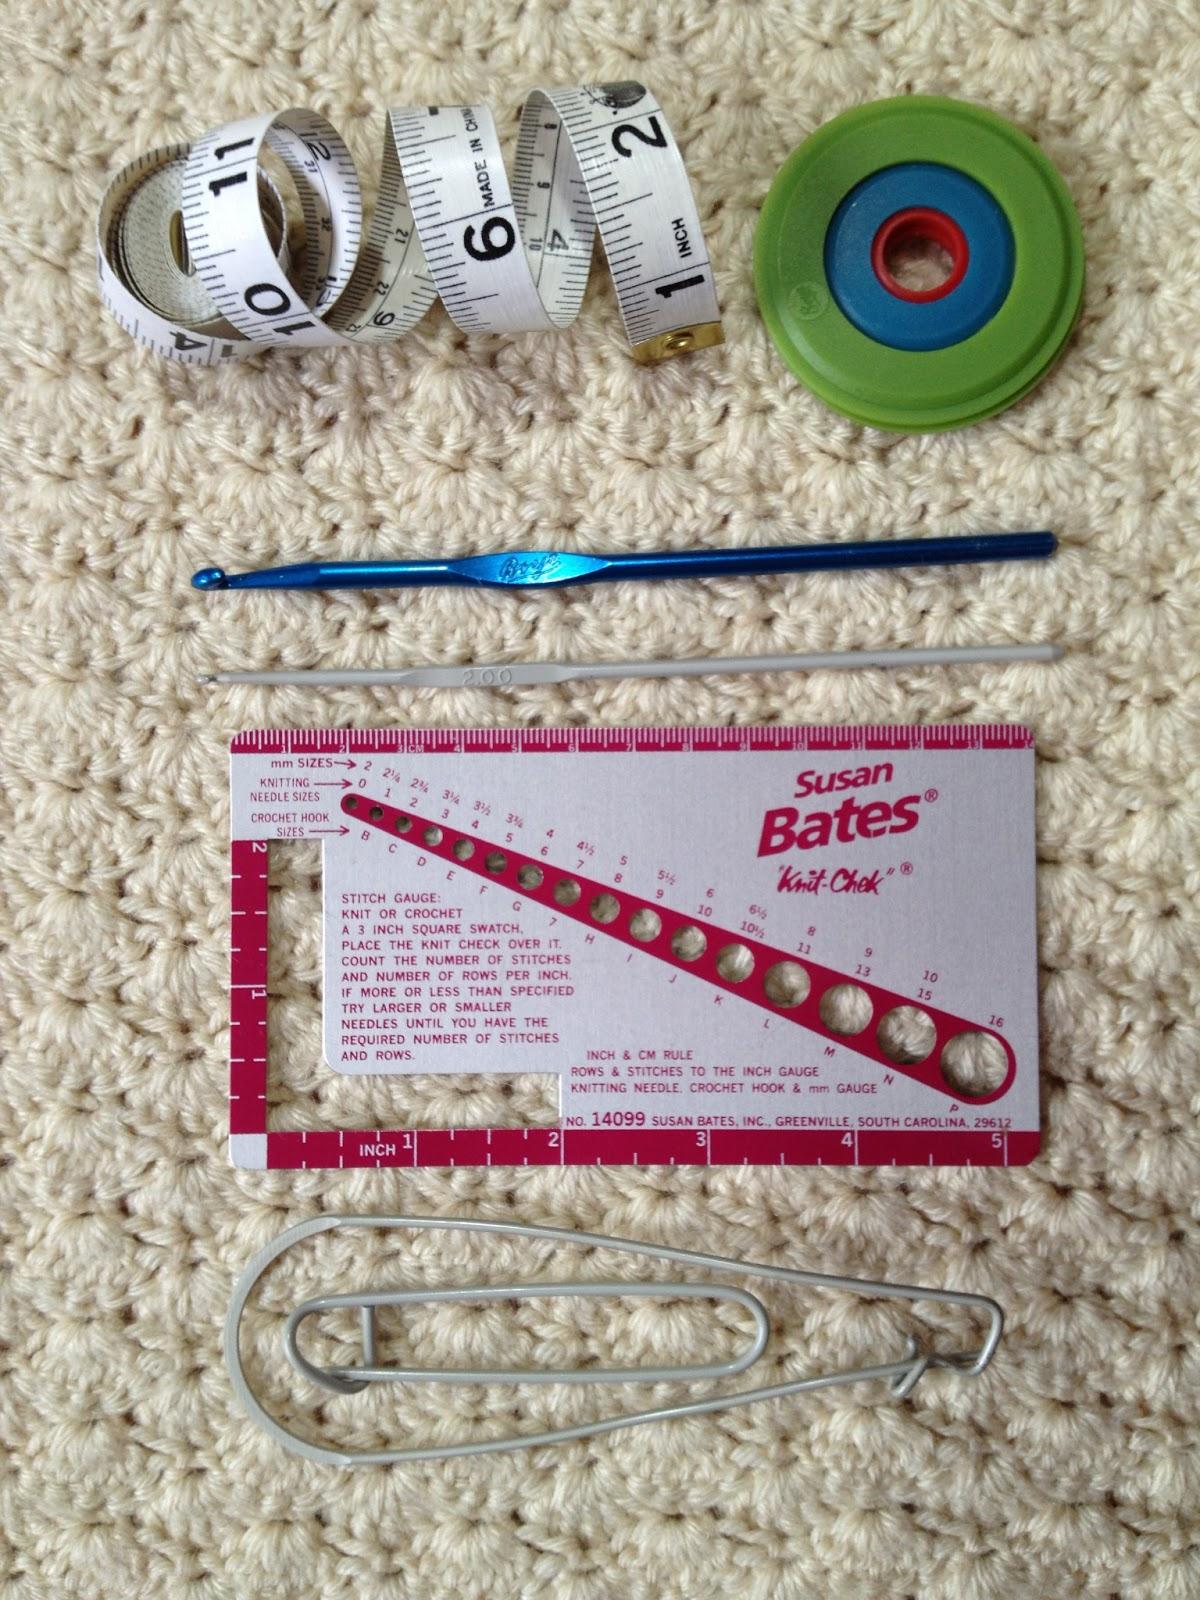 Crochet Stitch Gauge : ... TAPE, POM POM MAKER, CROCHET HOOKS, NEEDLE GAUGE, STITCH HOLDERS